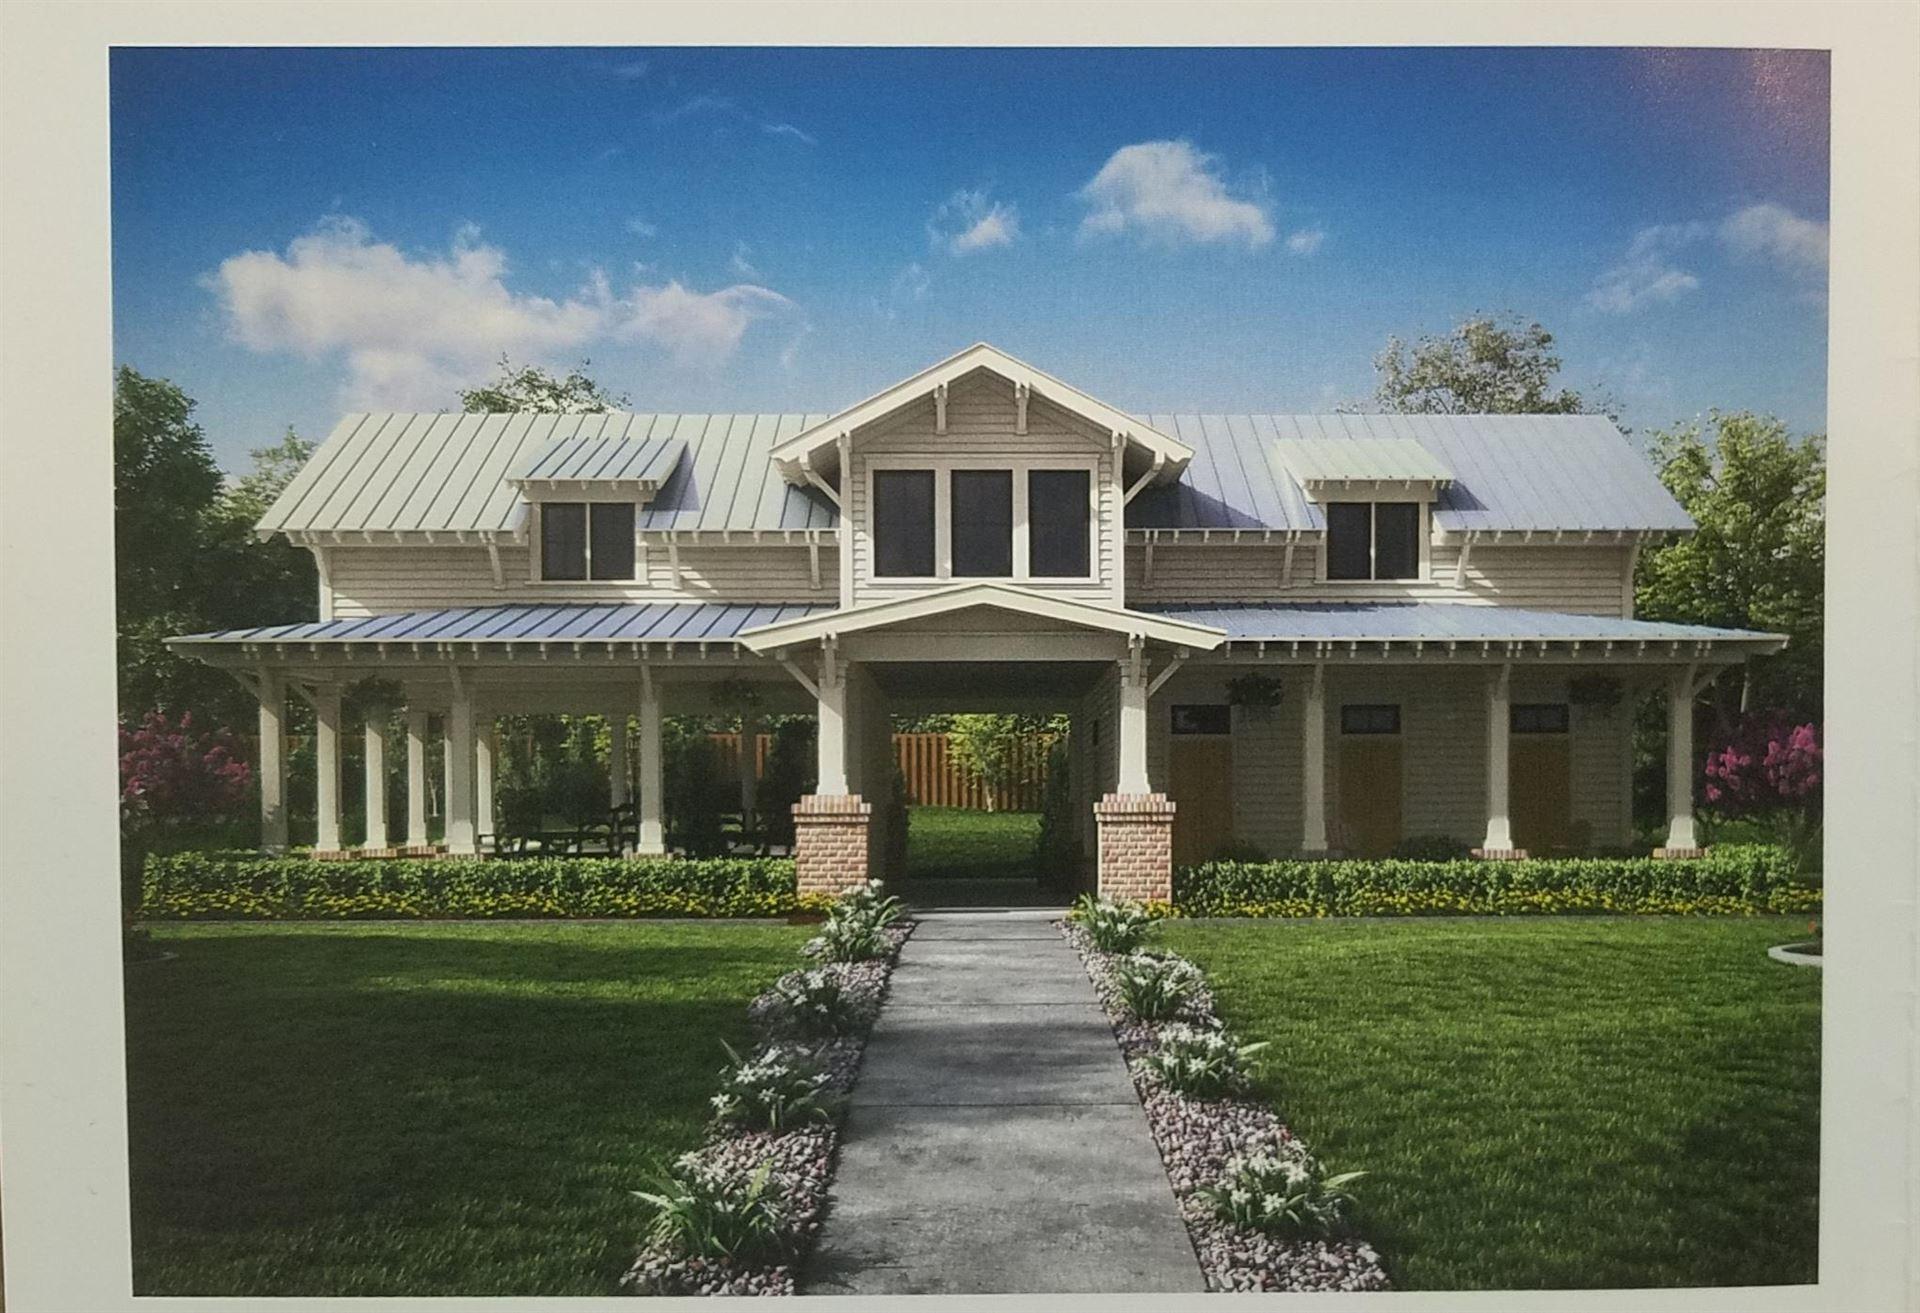 Photo of 521 Crutcher Court, Spring Hill, TN 37174 (MLS # 2090540)